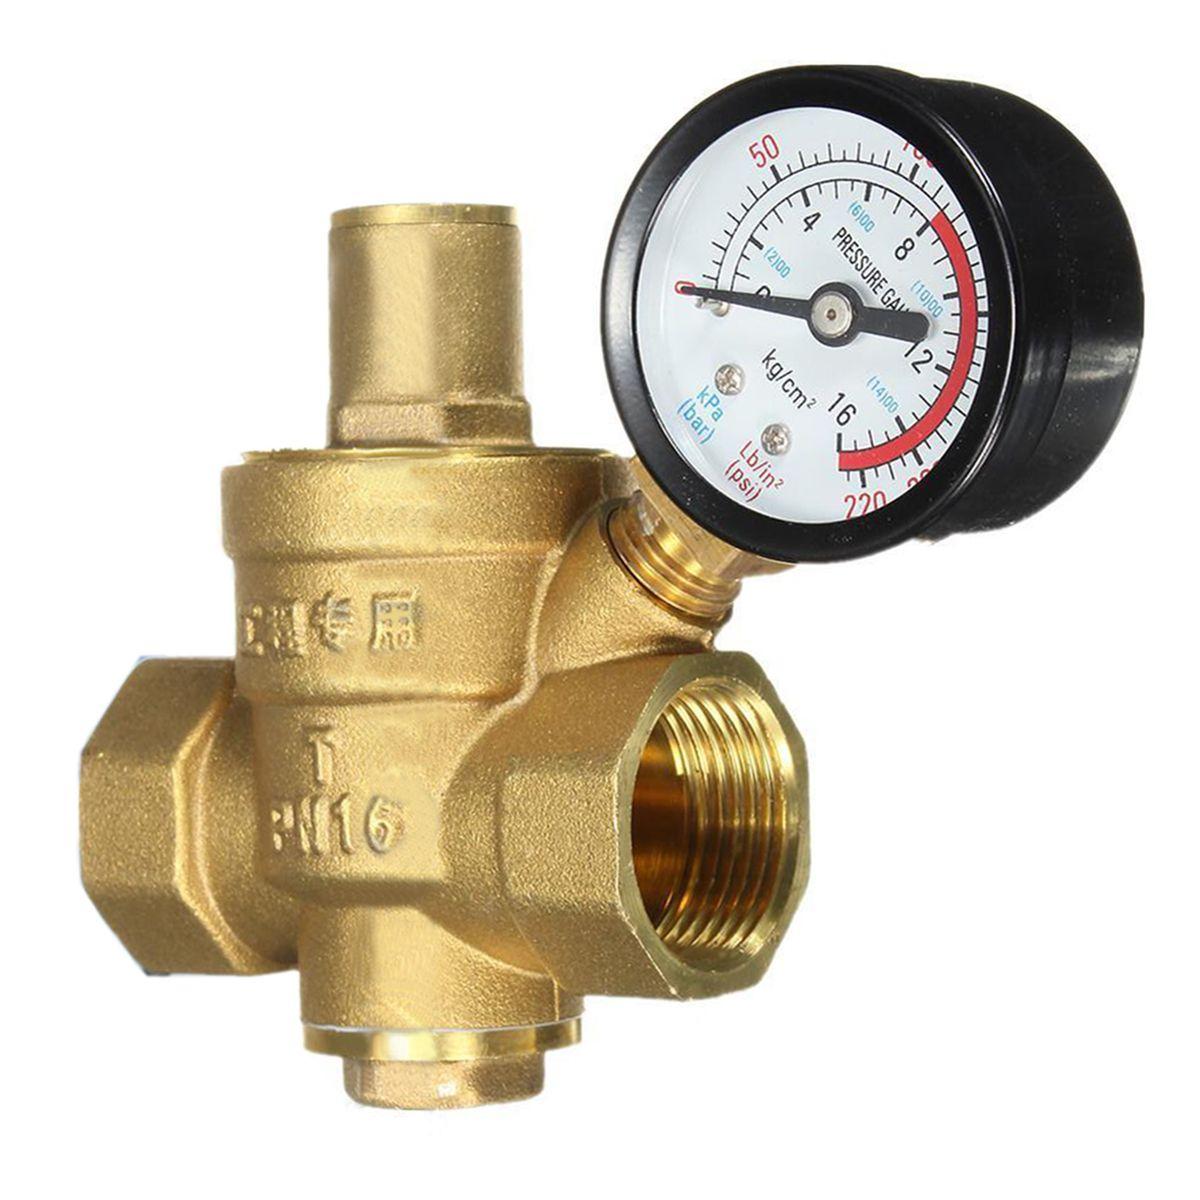 Reliable Brass Water Pressure Regulator With Gauge Flow Dn20 3 4 Connector Adjustable Mayitr Pressure Reducing Valves Affiliate